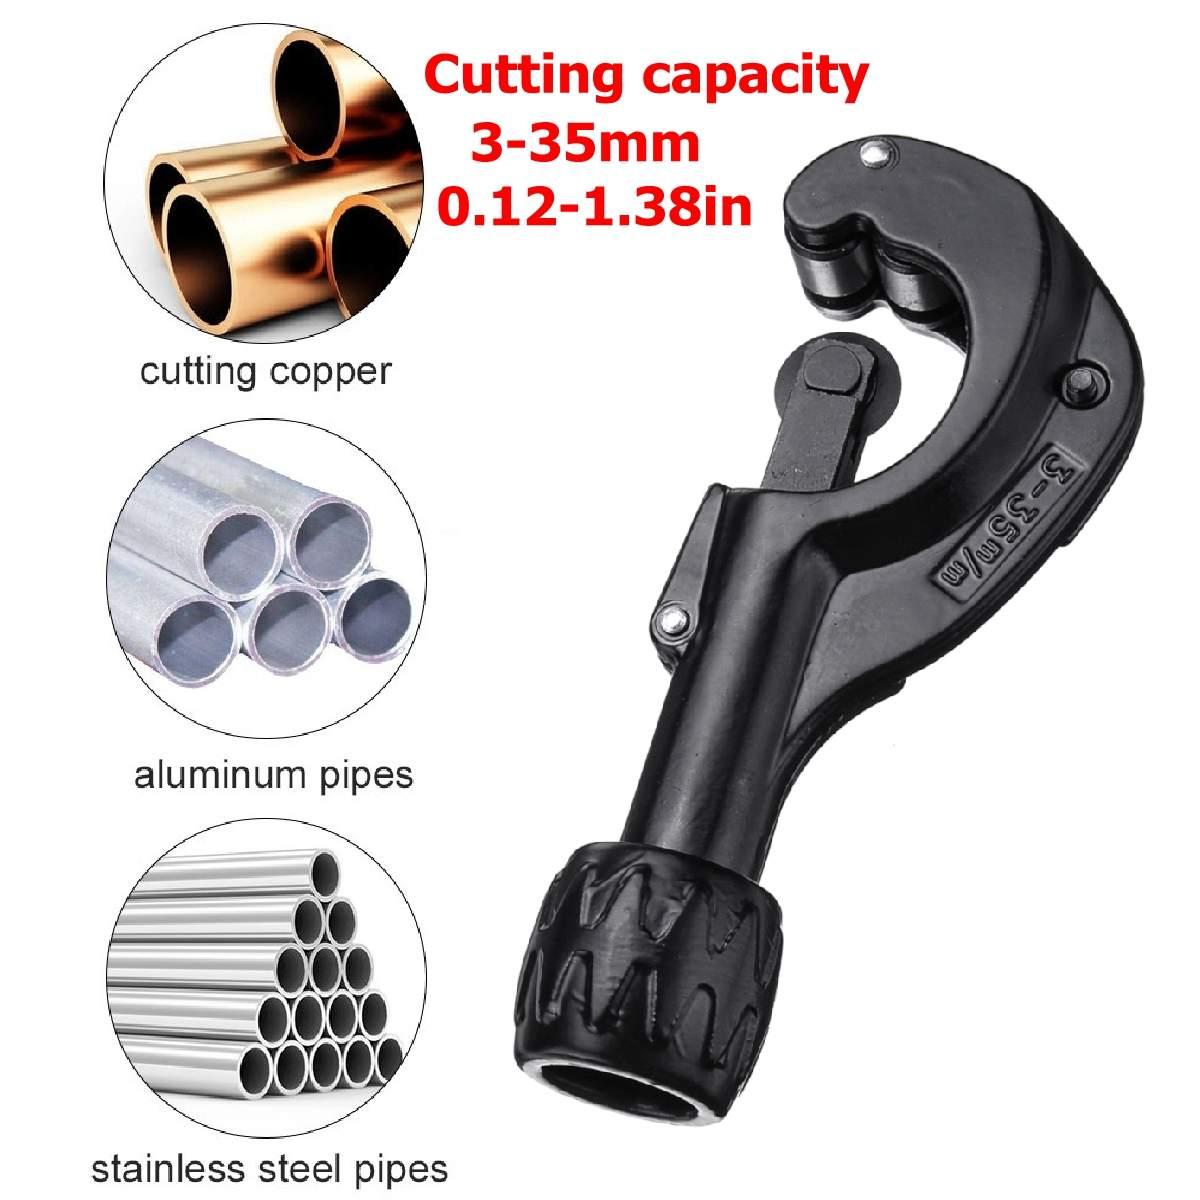 Copper Vinyl Brass Pipes Tube Cutter Scissor Cutting Tool For 3mm-35mm G Type Metal/Plastic Tube Knife Cut Plumbing Tool